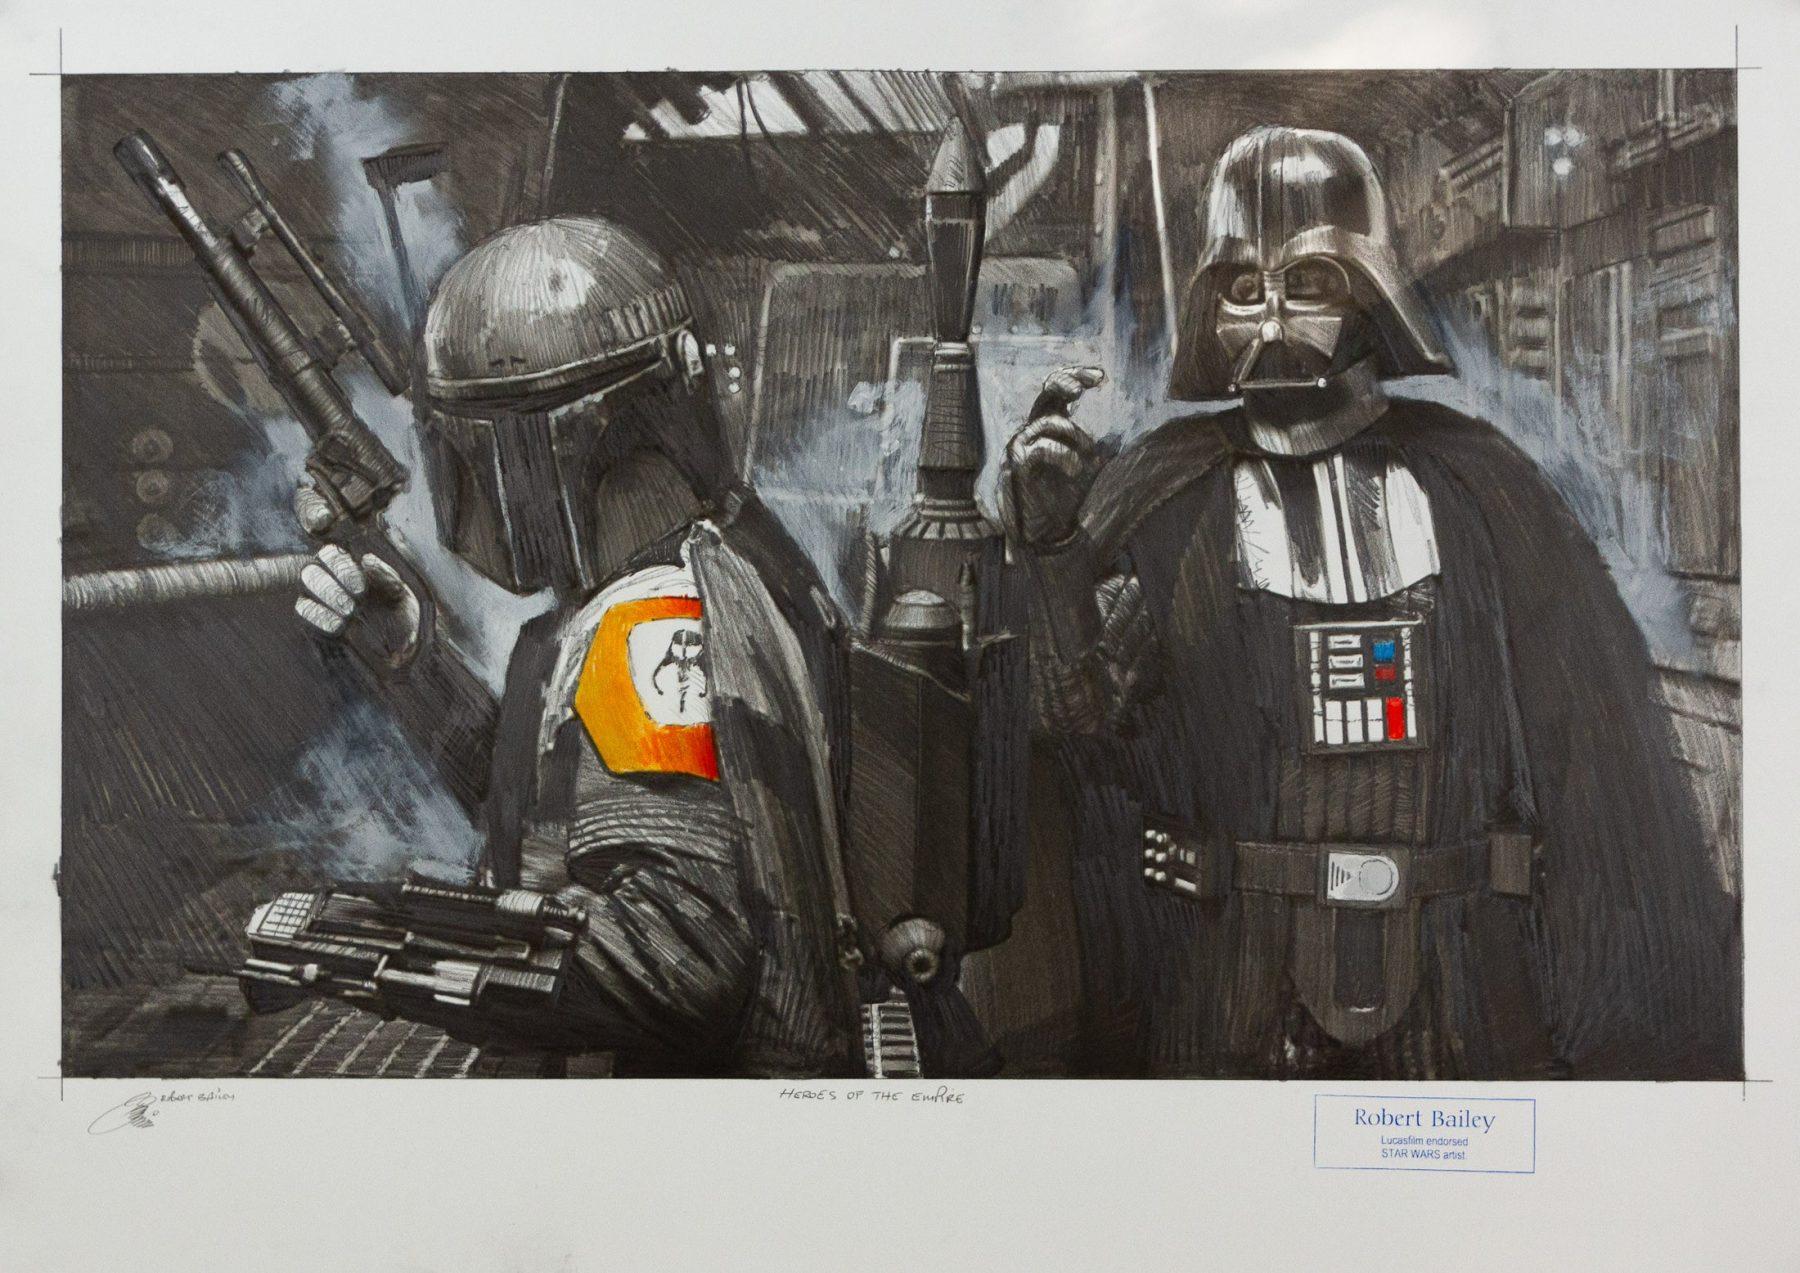 Heroes of the empire - Bailey, Robert - k-2012RB3